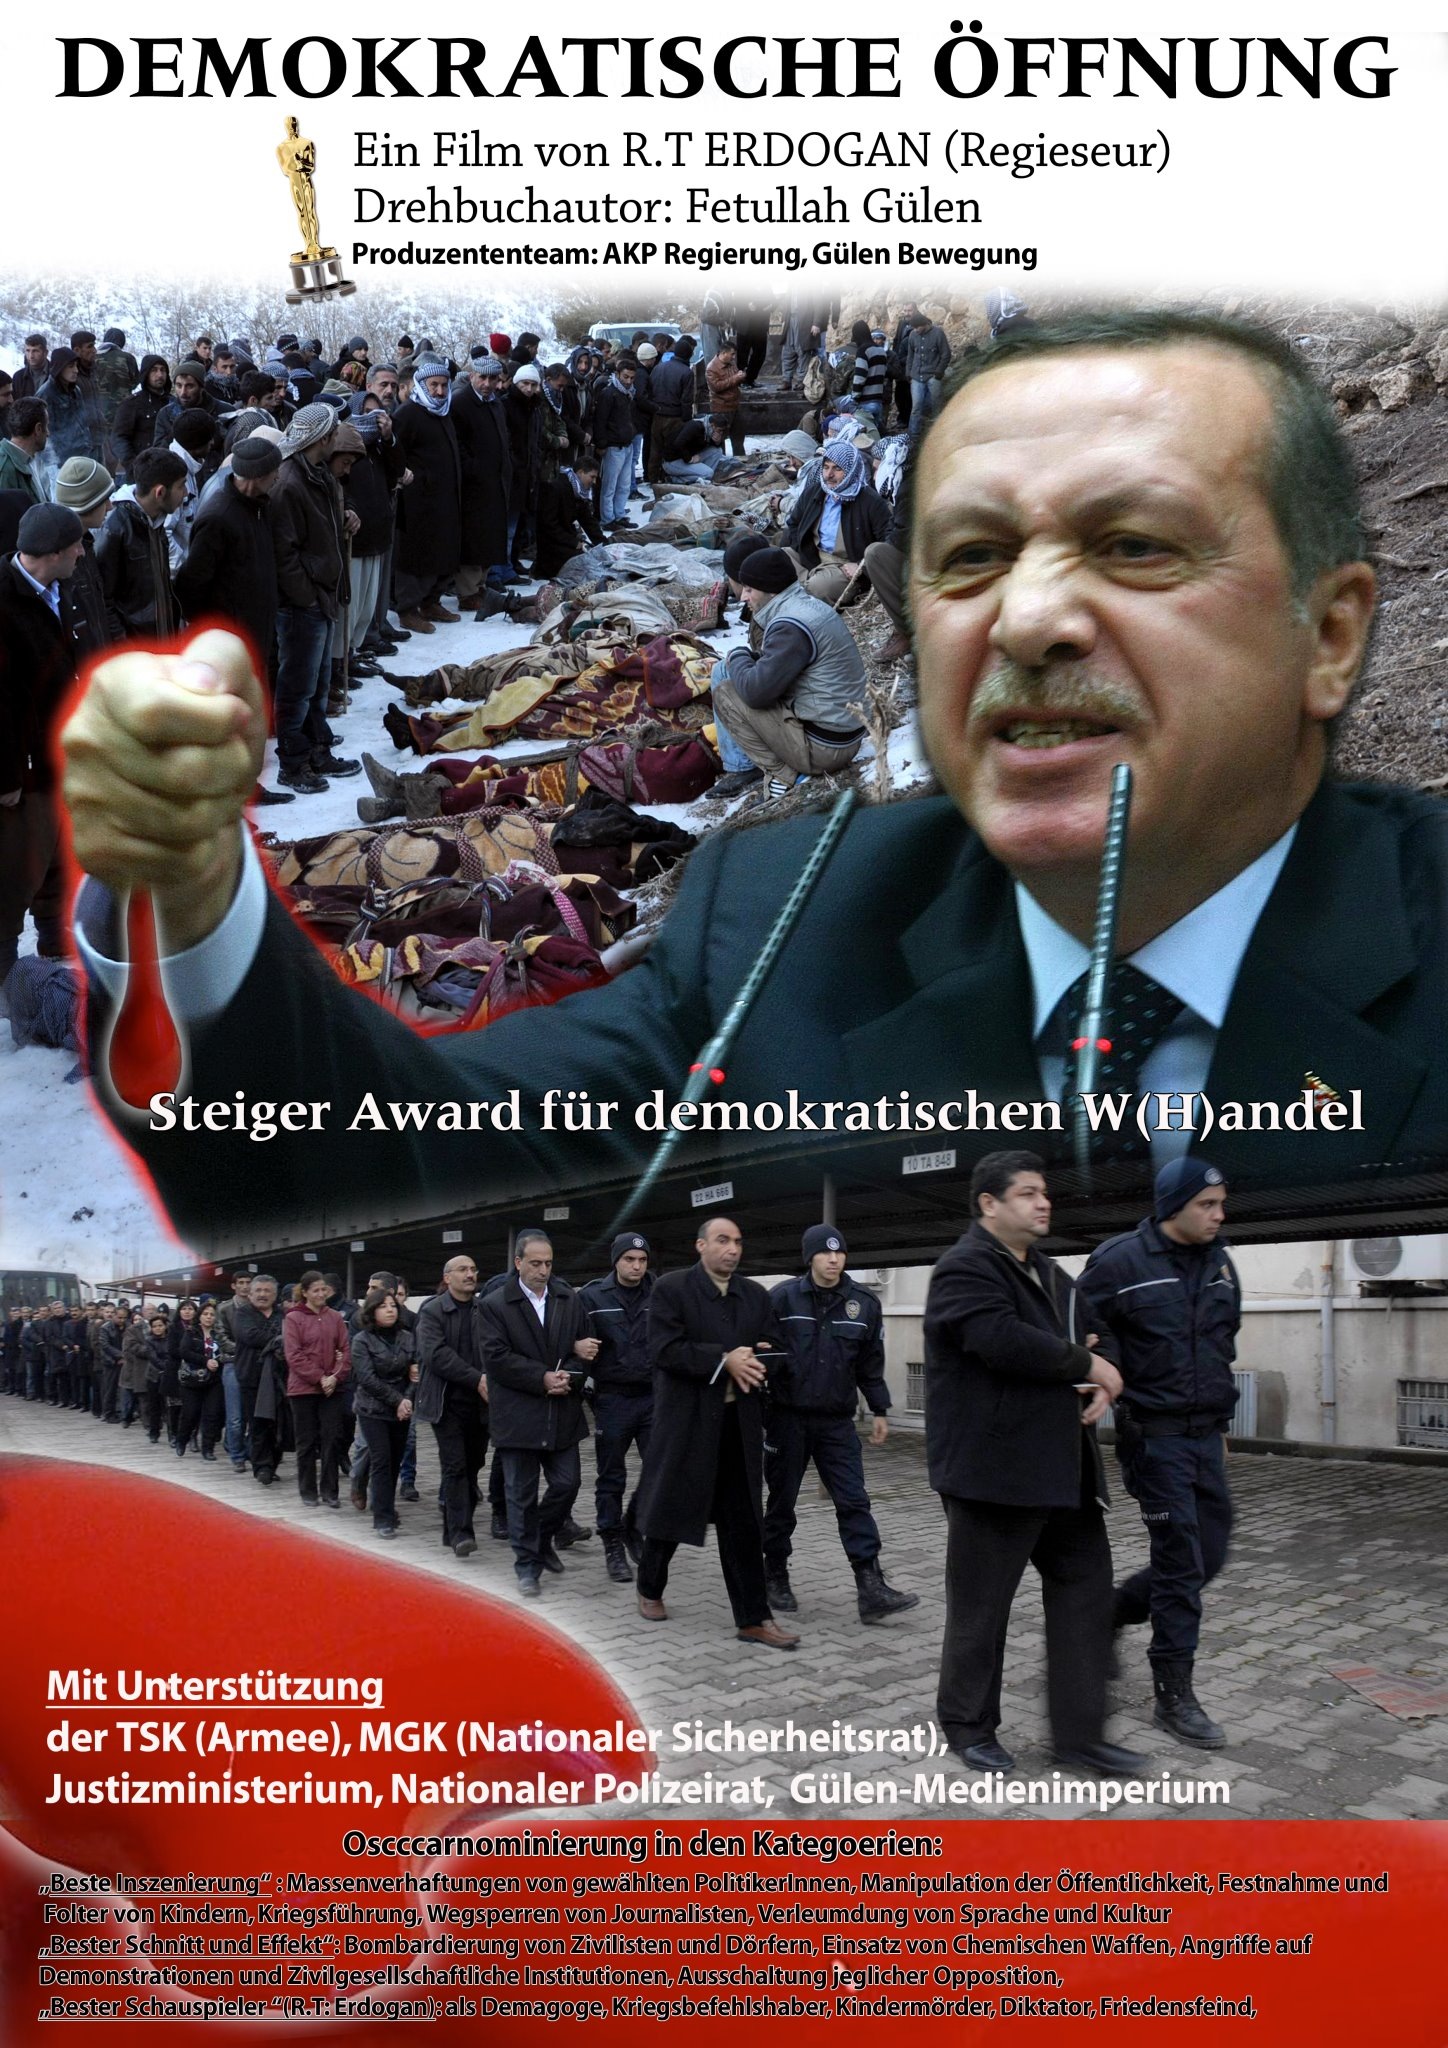 Steiger Award - Erdogan